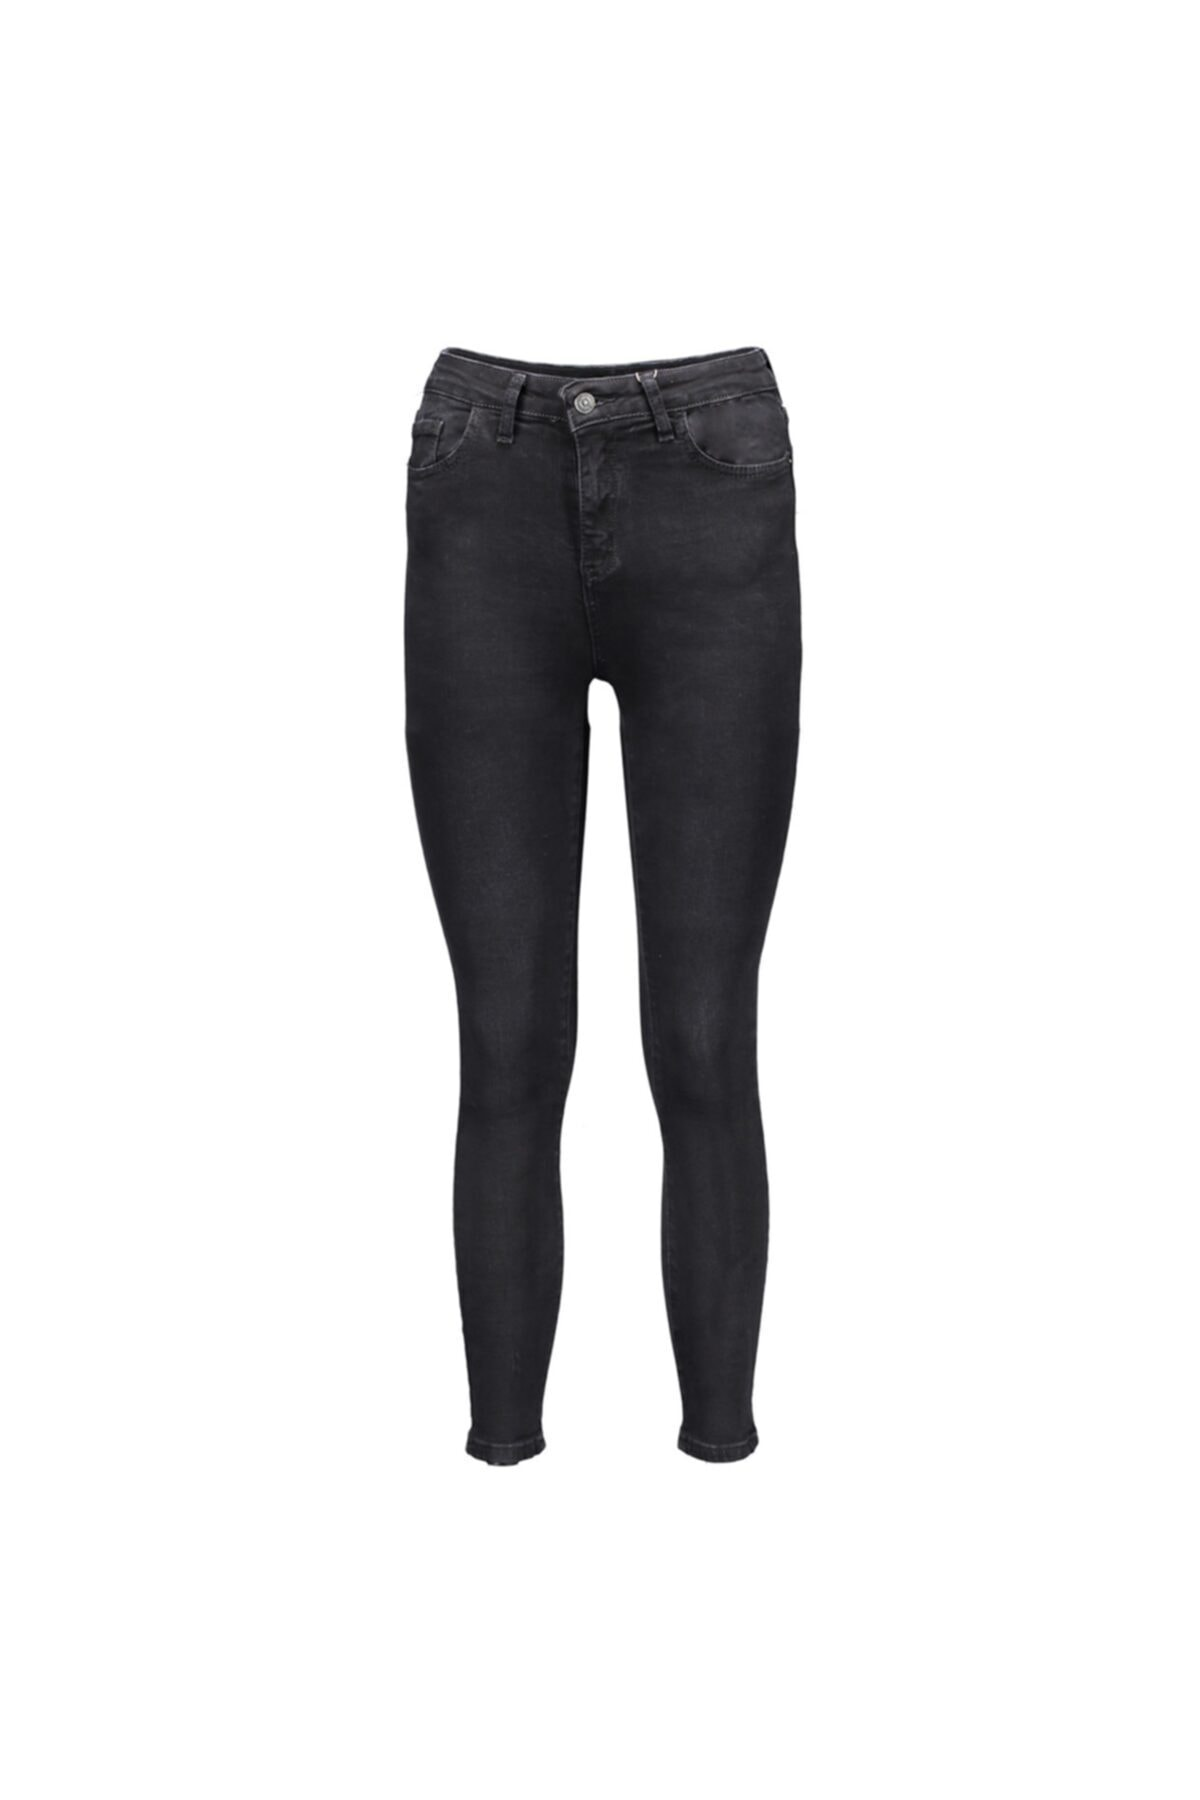 Collezione Siyah Kadın Denim Pantolon 1